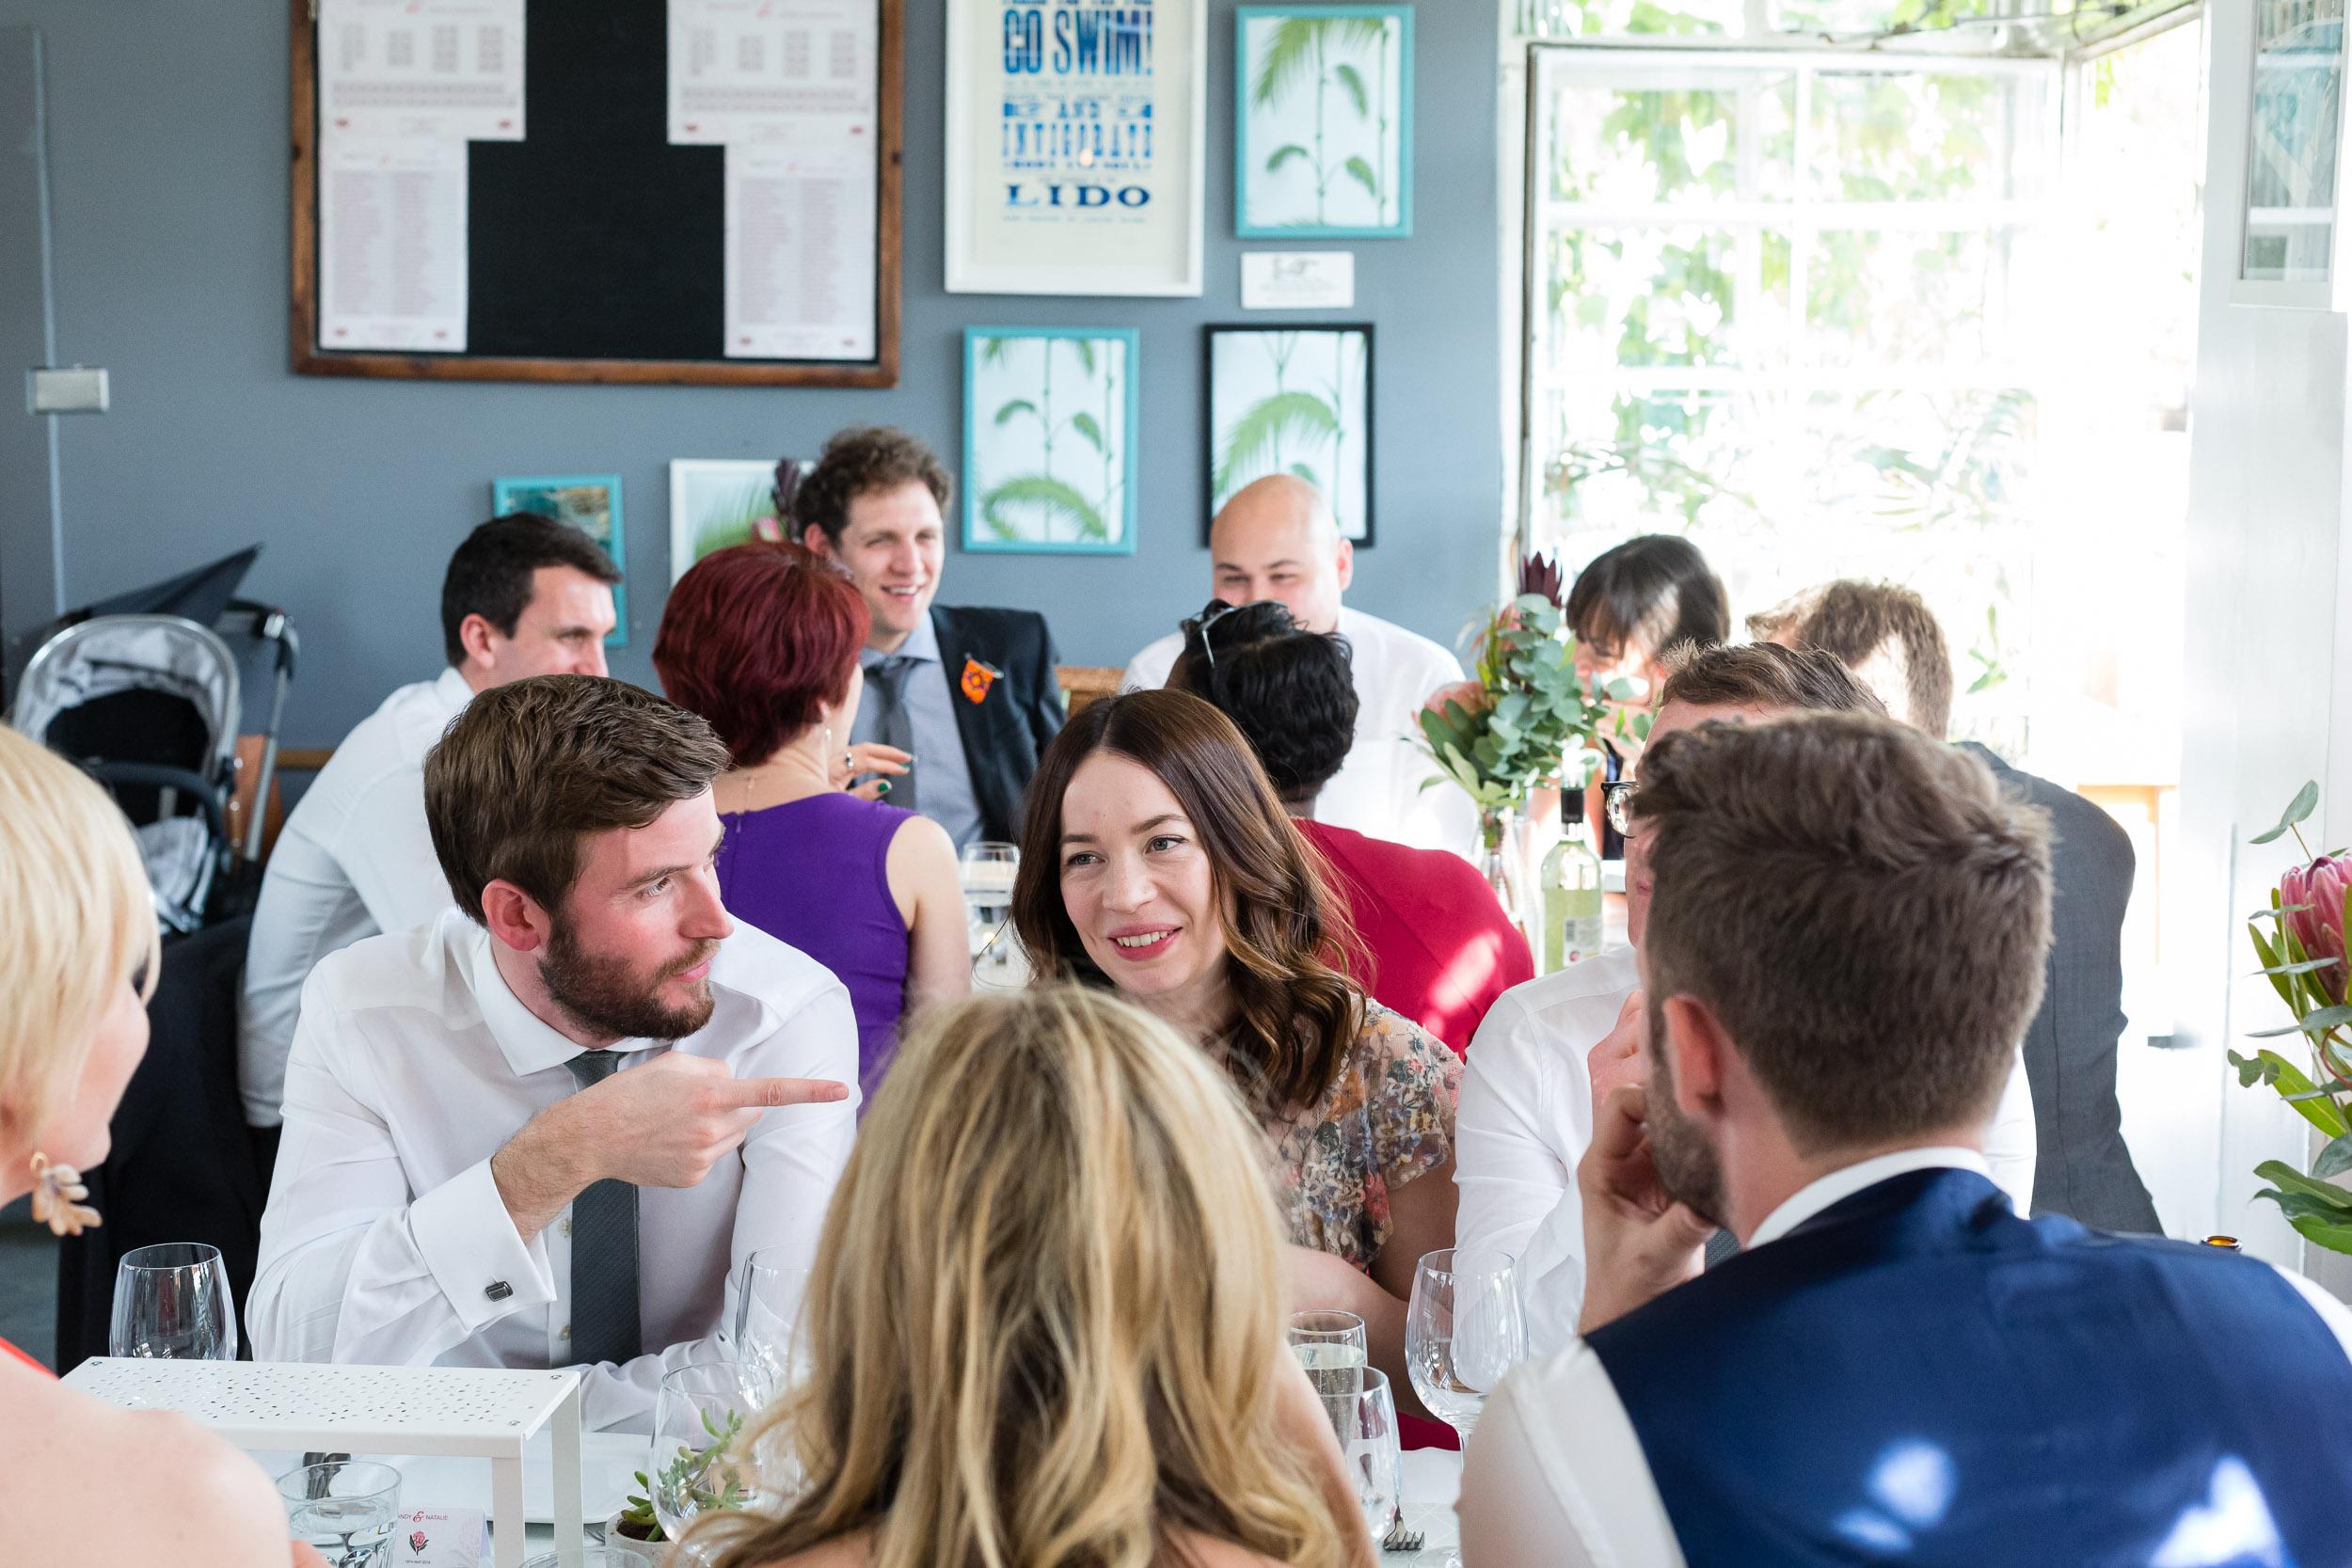 brockwell-lido-brixton-herne-hill-wedding-314.jpg